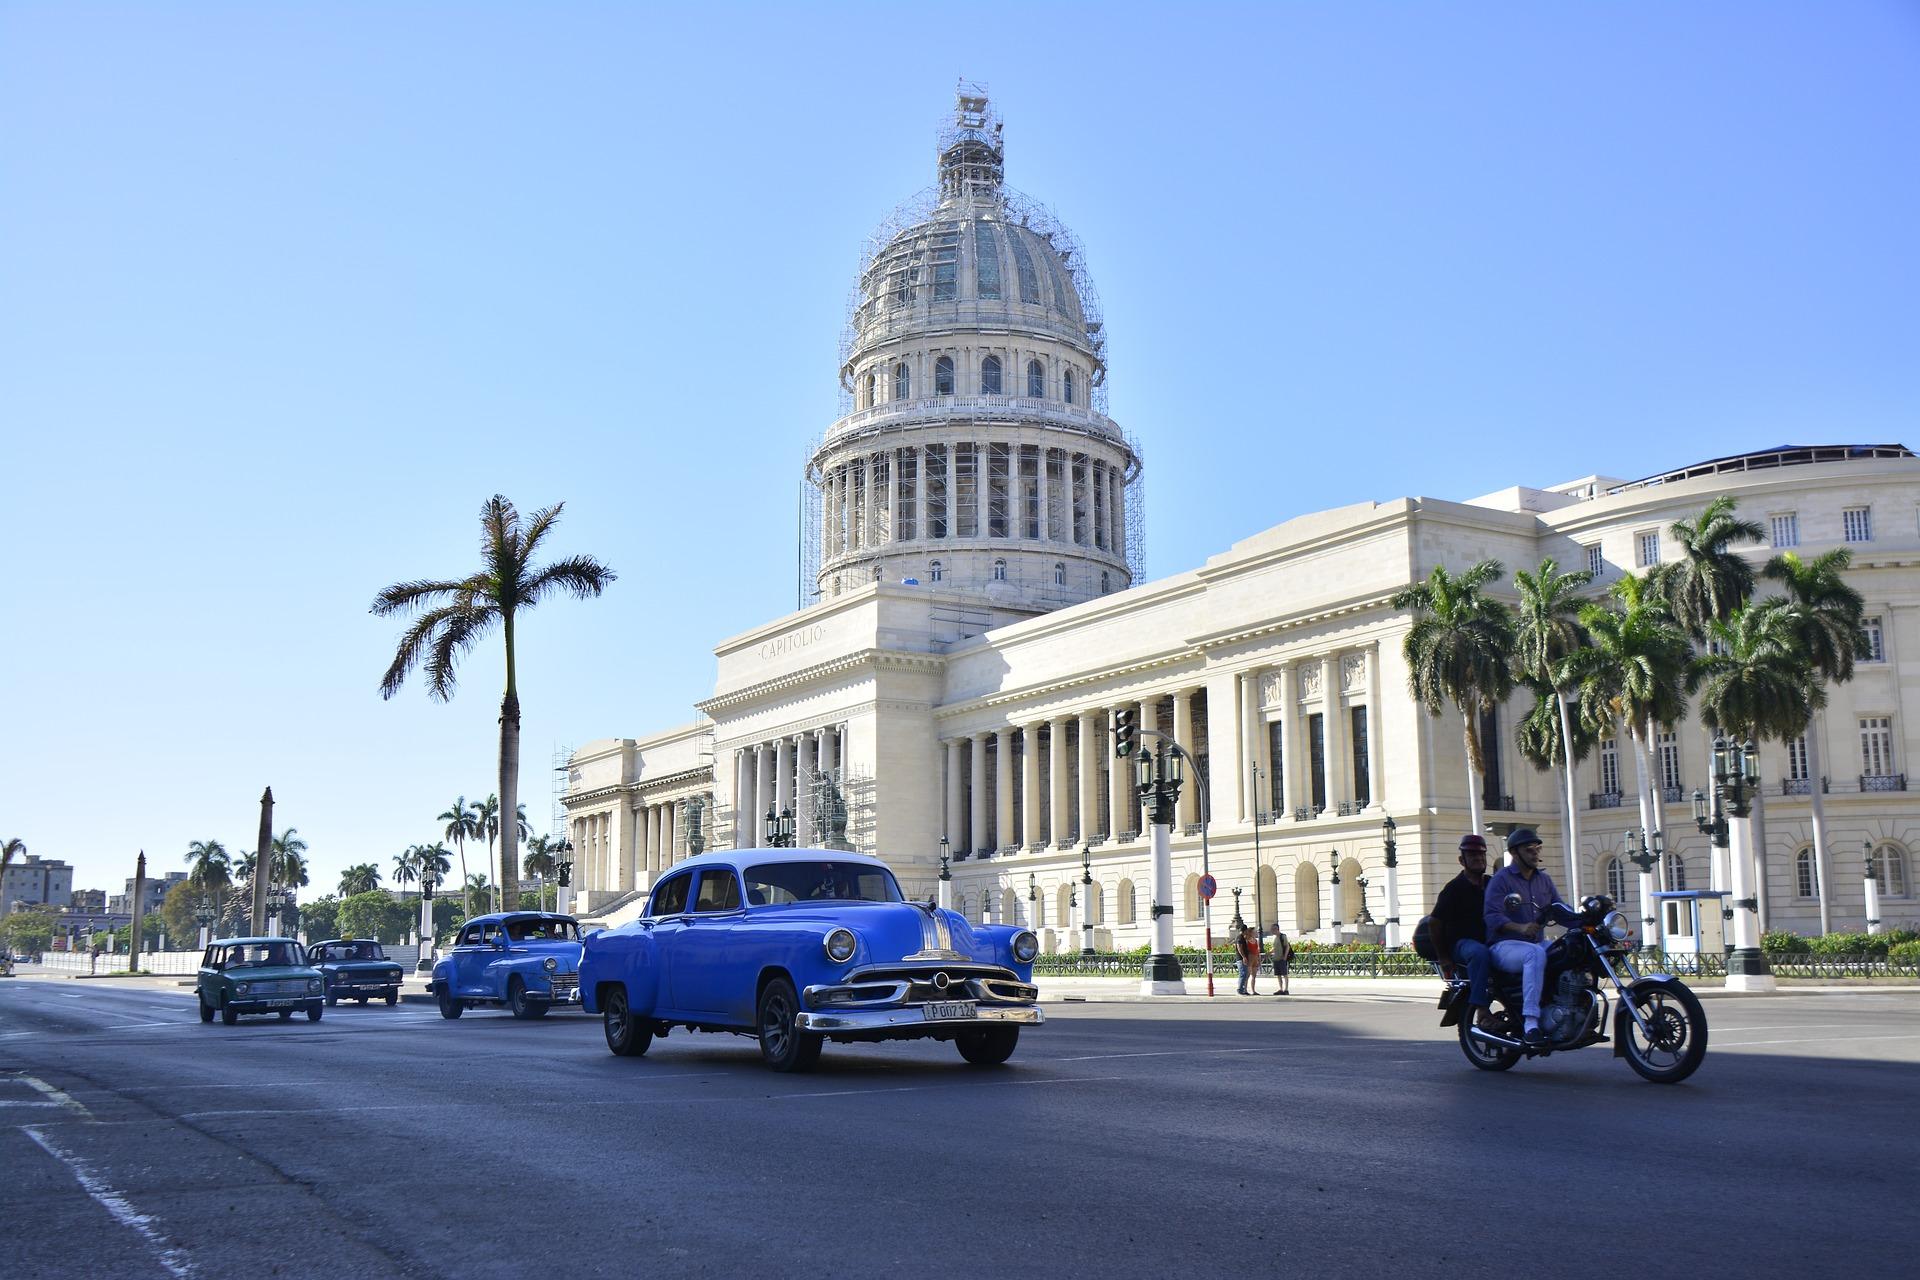 Flüge: Kuba [April 2018 - Frühjahr 2019] Hin- und Rückflug nach Havanna in der Business Class